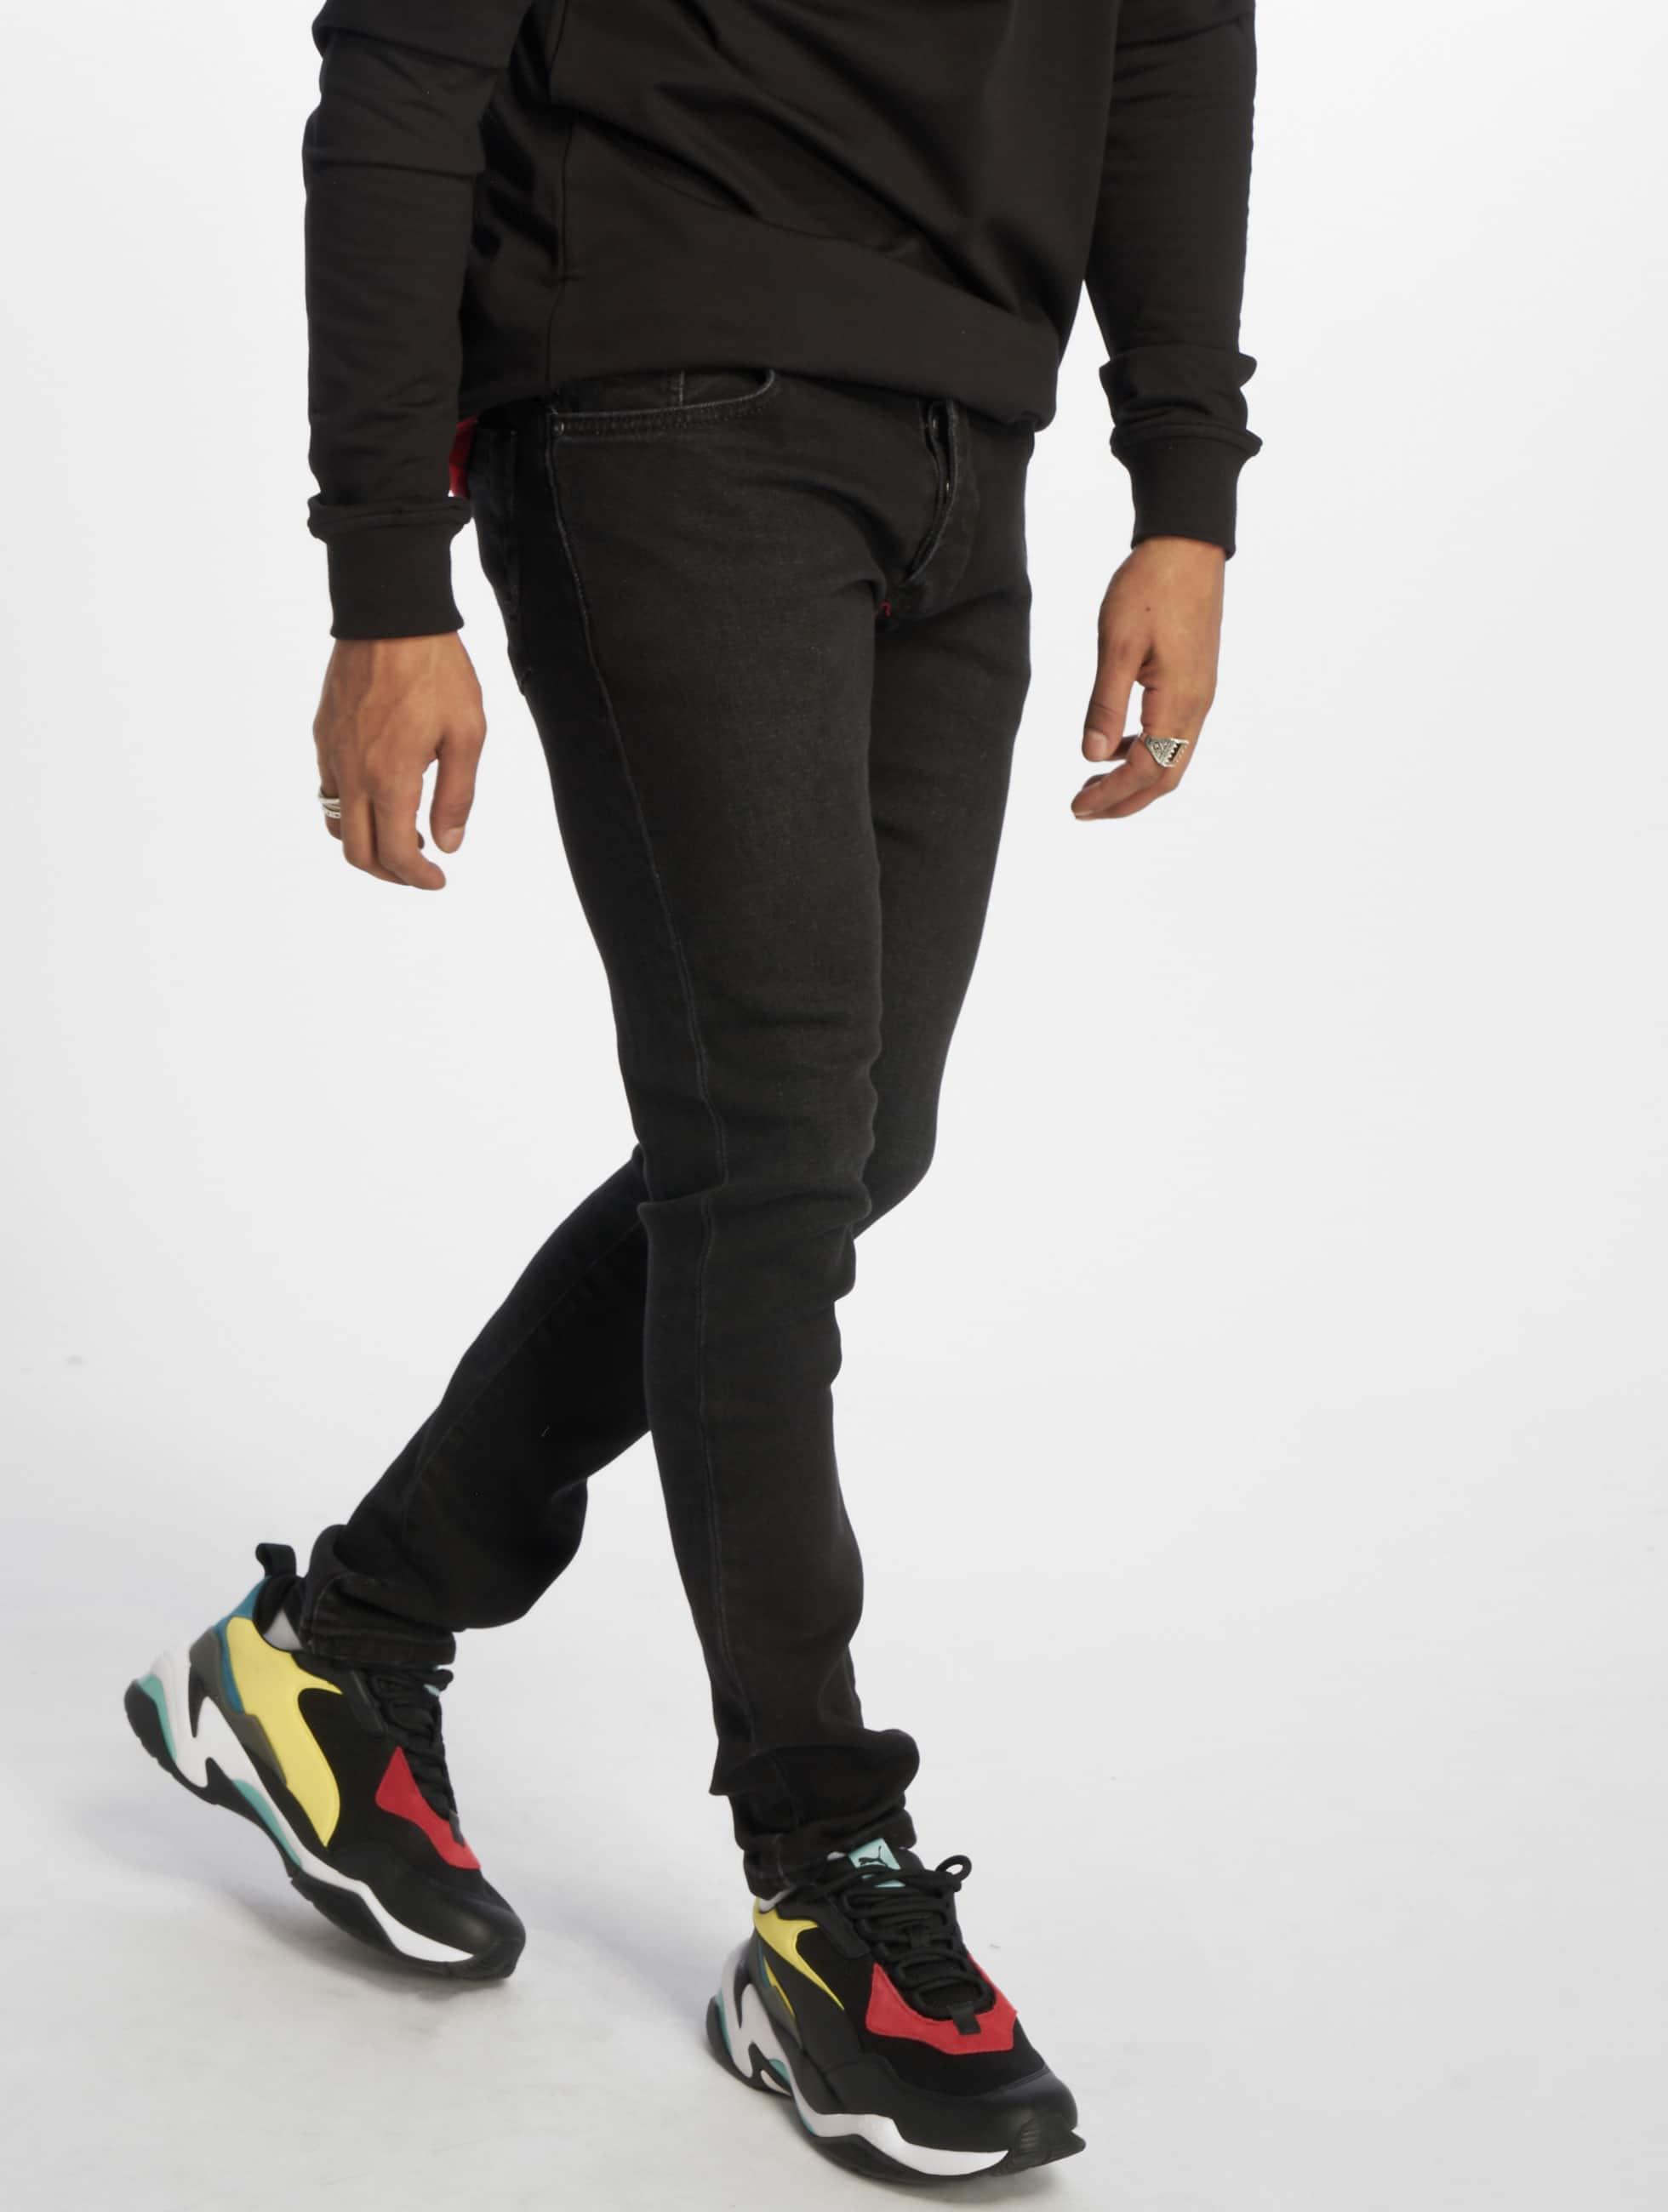 2Y / Slim Fit Jeans Taron in black W 31